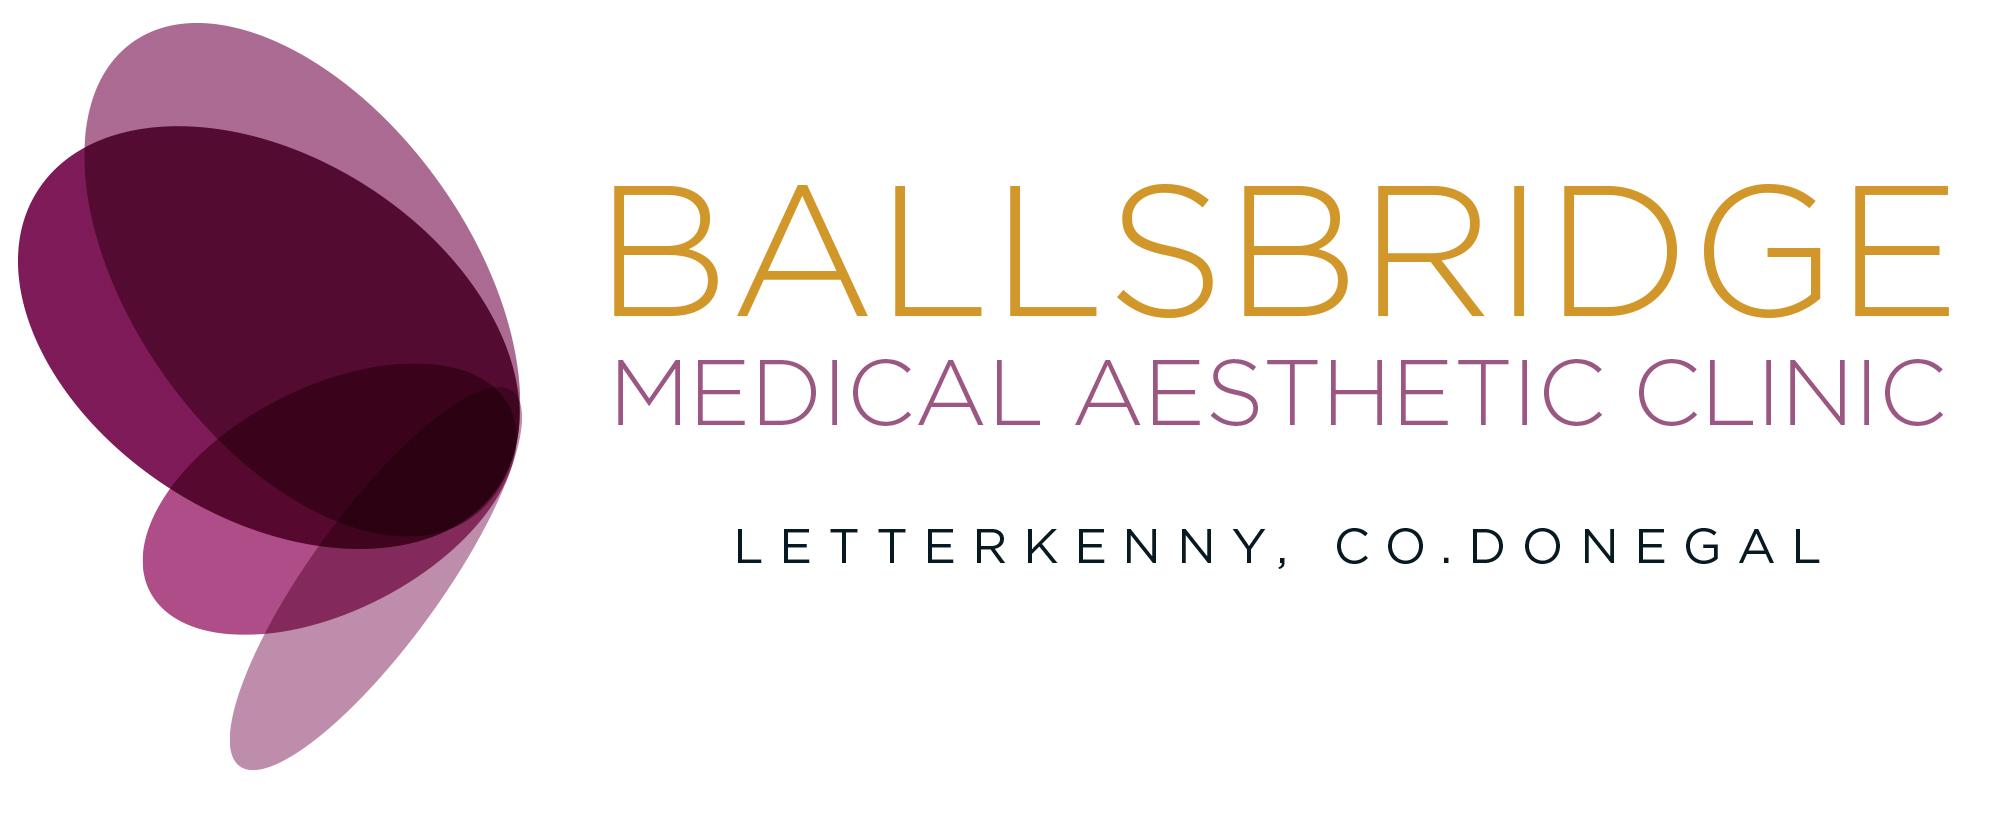 About Us - Ballsbridge Clinic - Botox, Fillers, Letterkenny